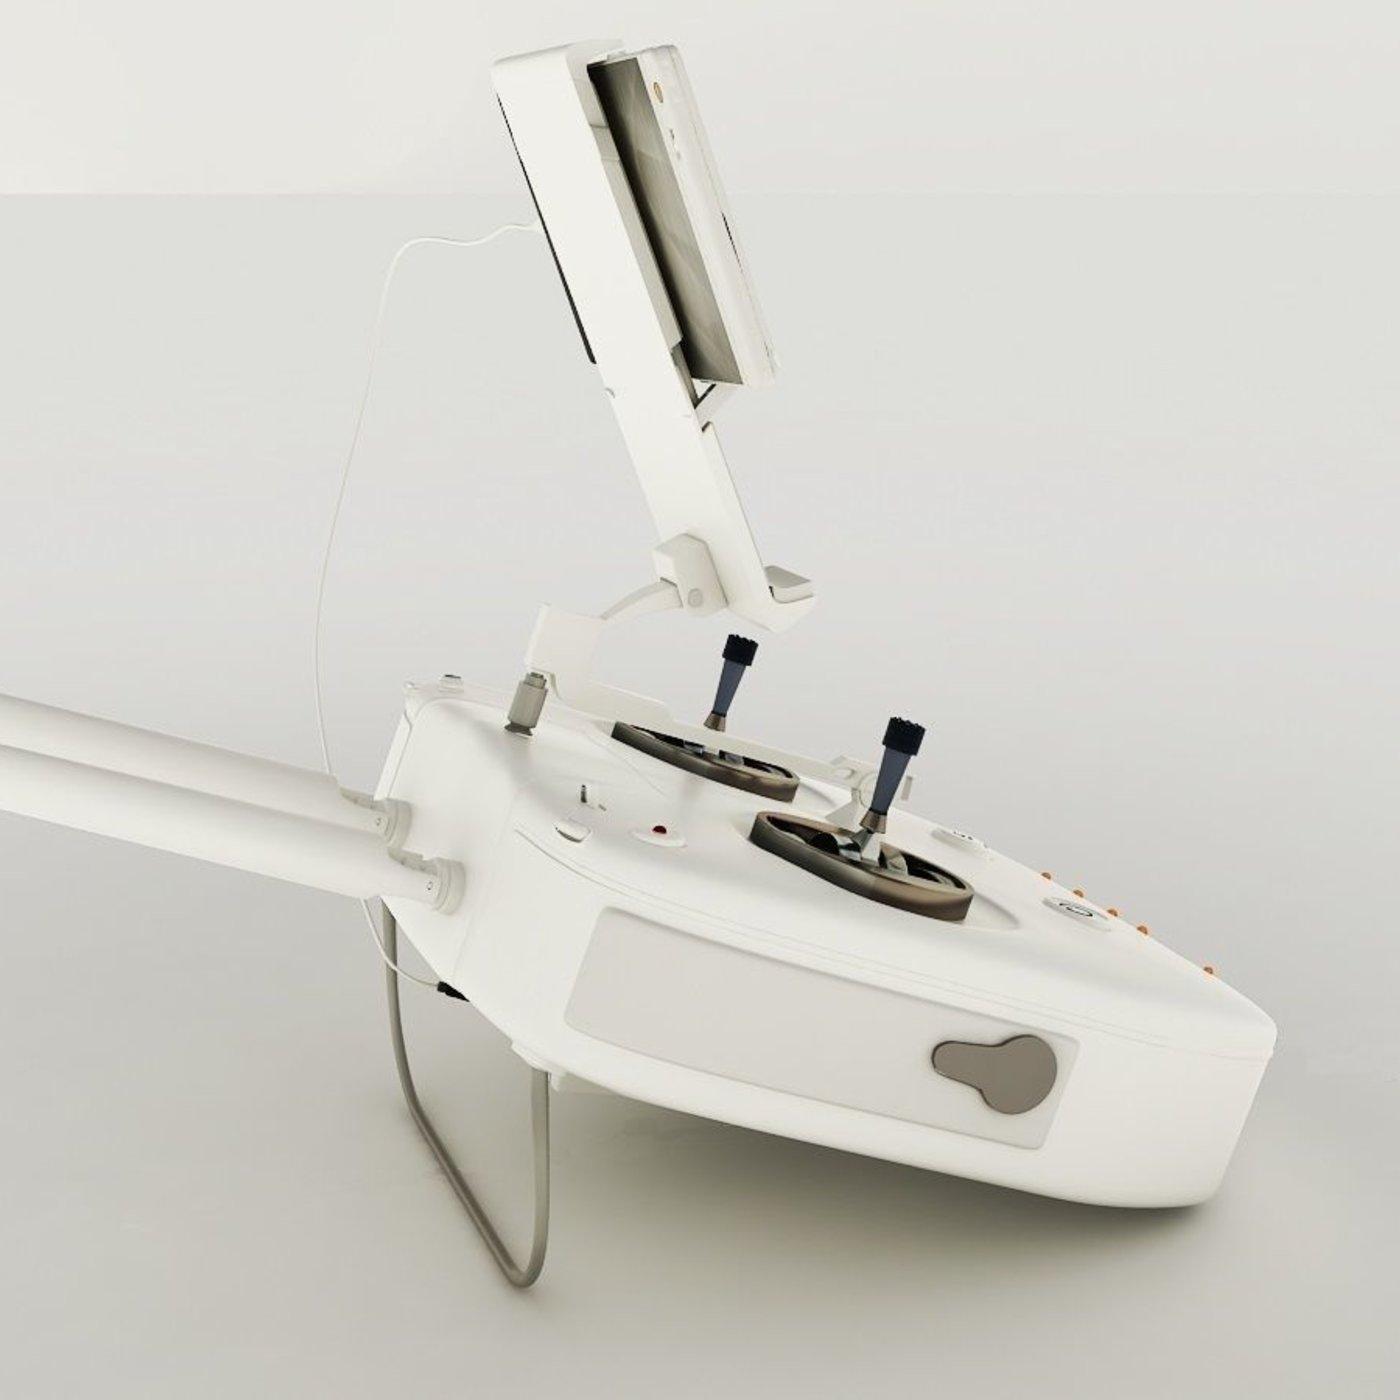 DJI Phantom 3 Remote Control